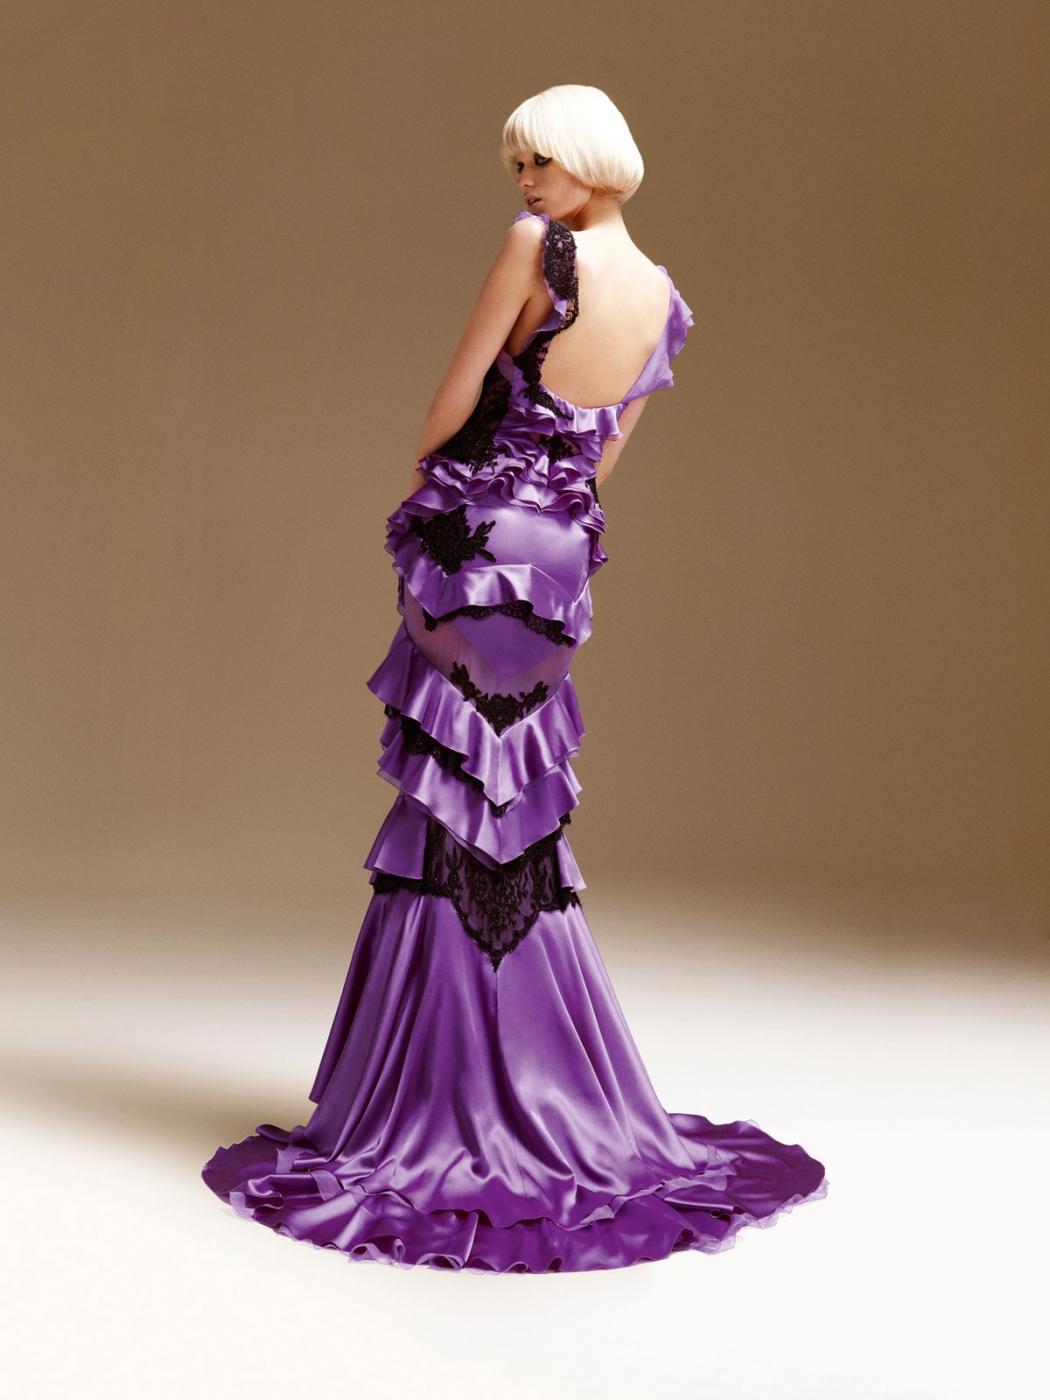 Burst in Style: Abbey Lee Kershaw Stunning Versace S/S